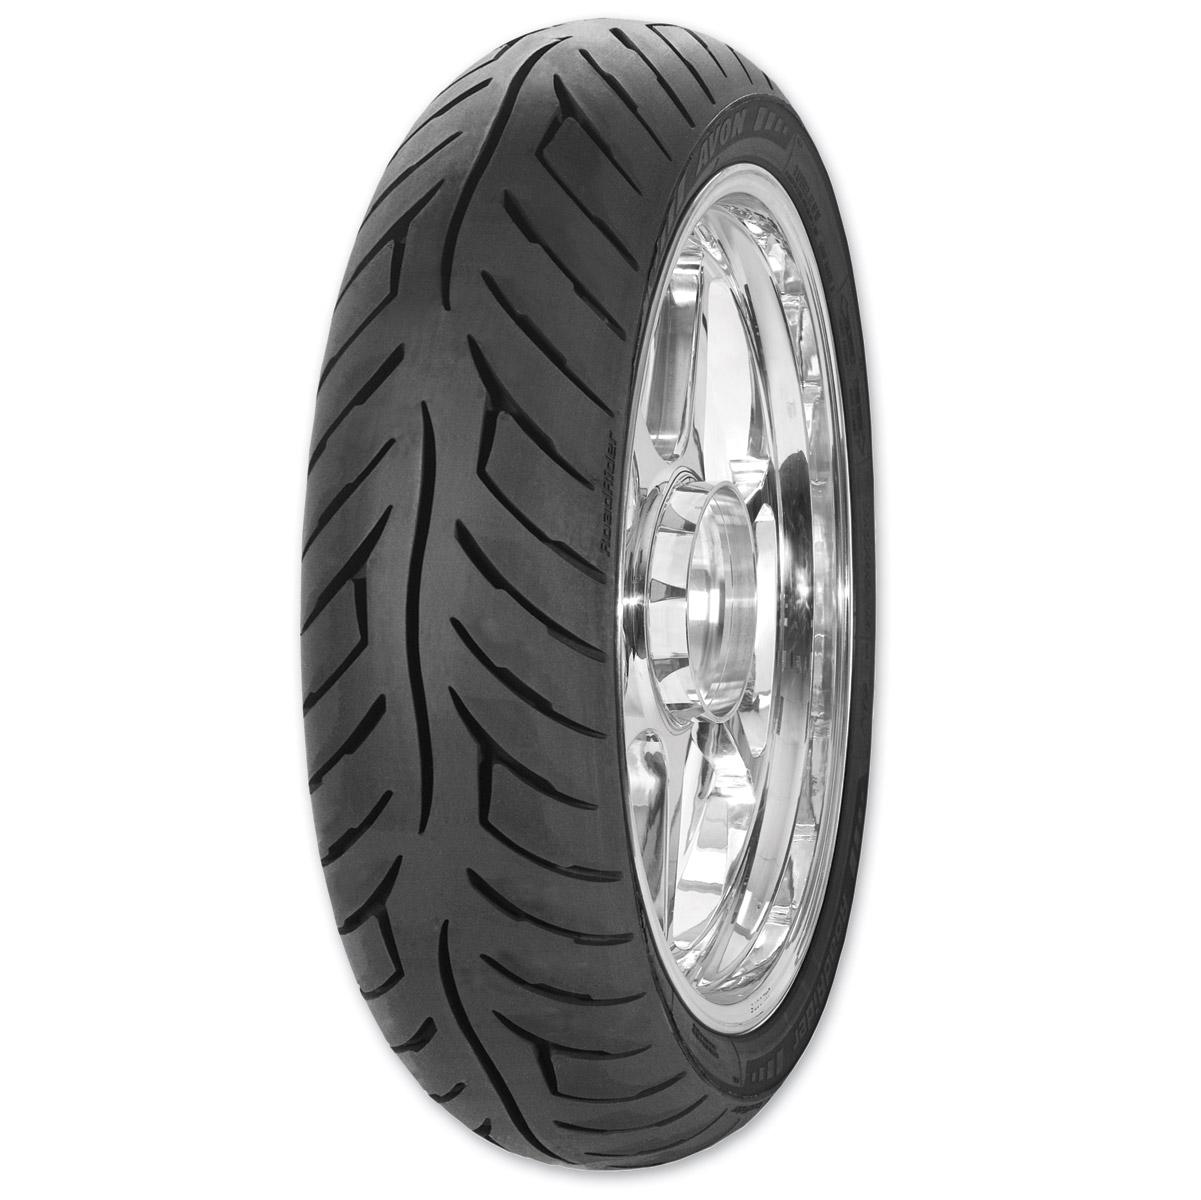 Avon AM26 Roadrider 150/80-16 Rear Tire